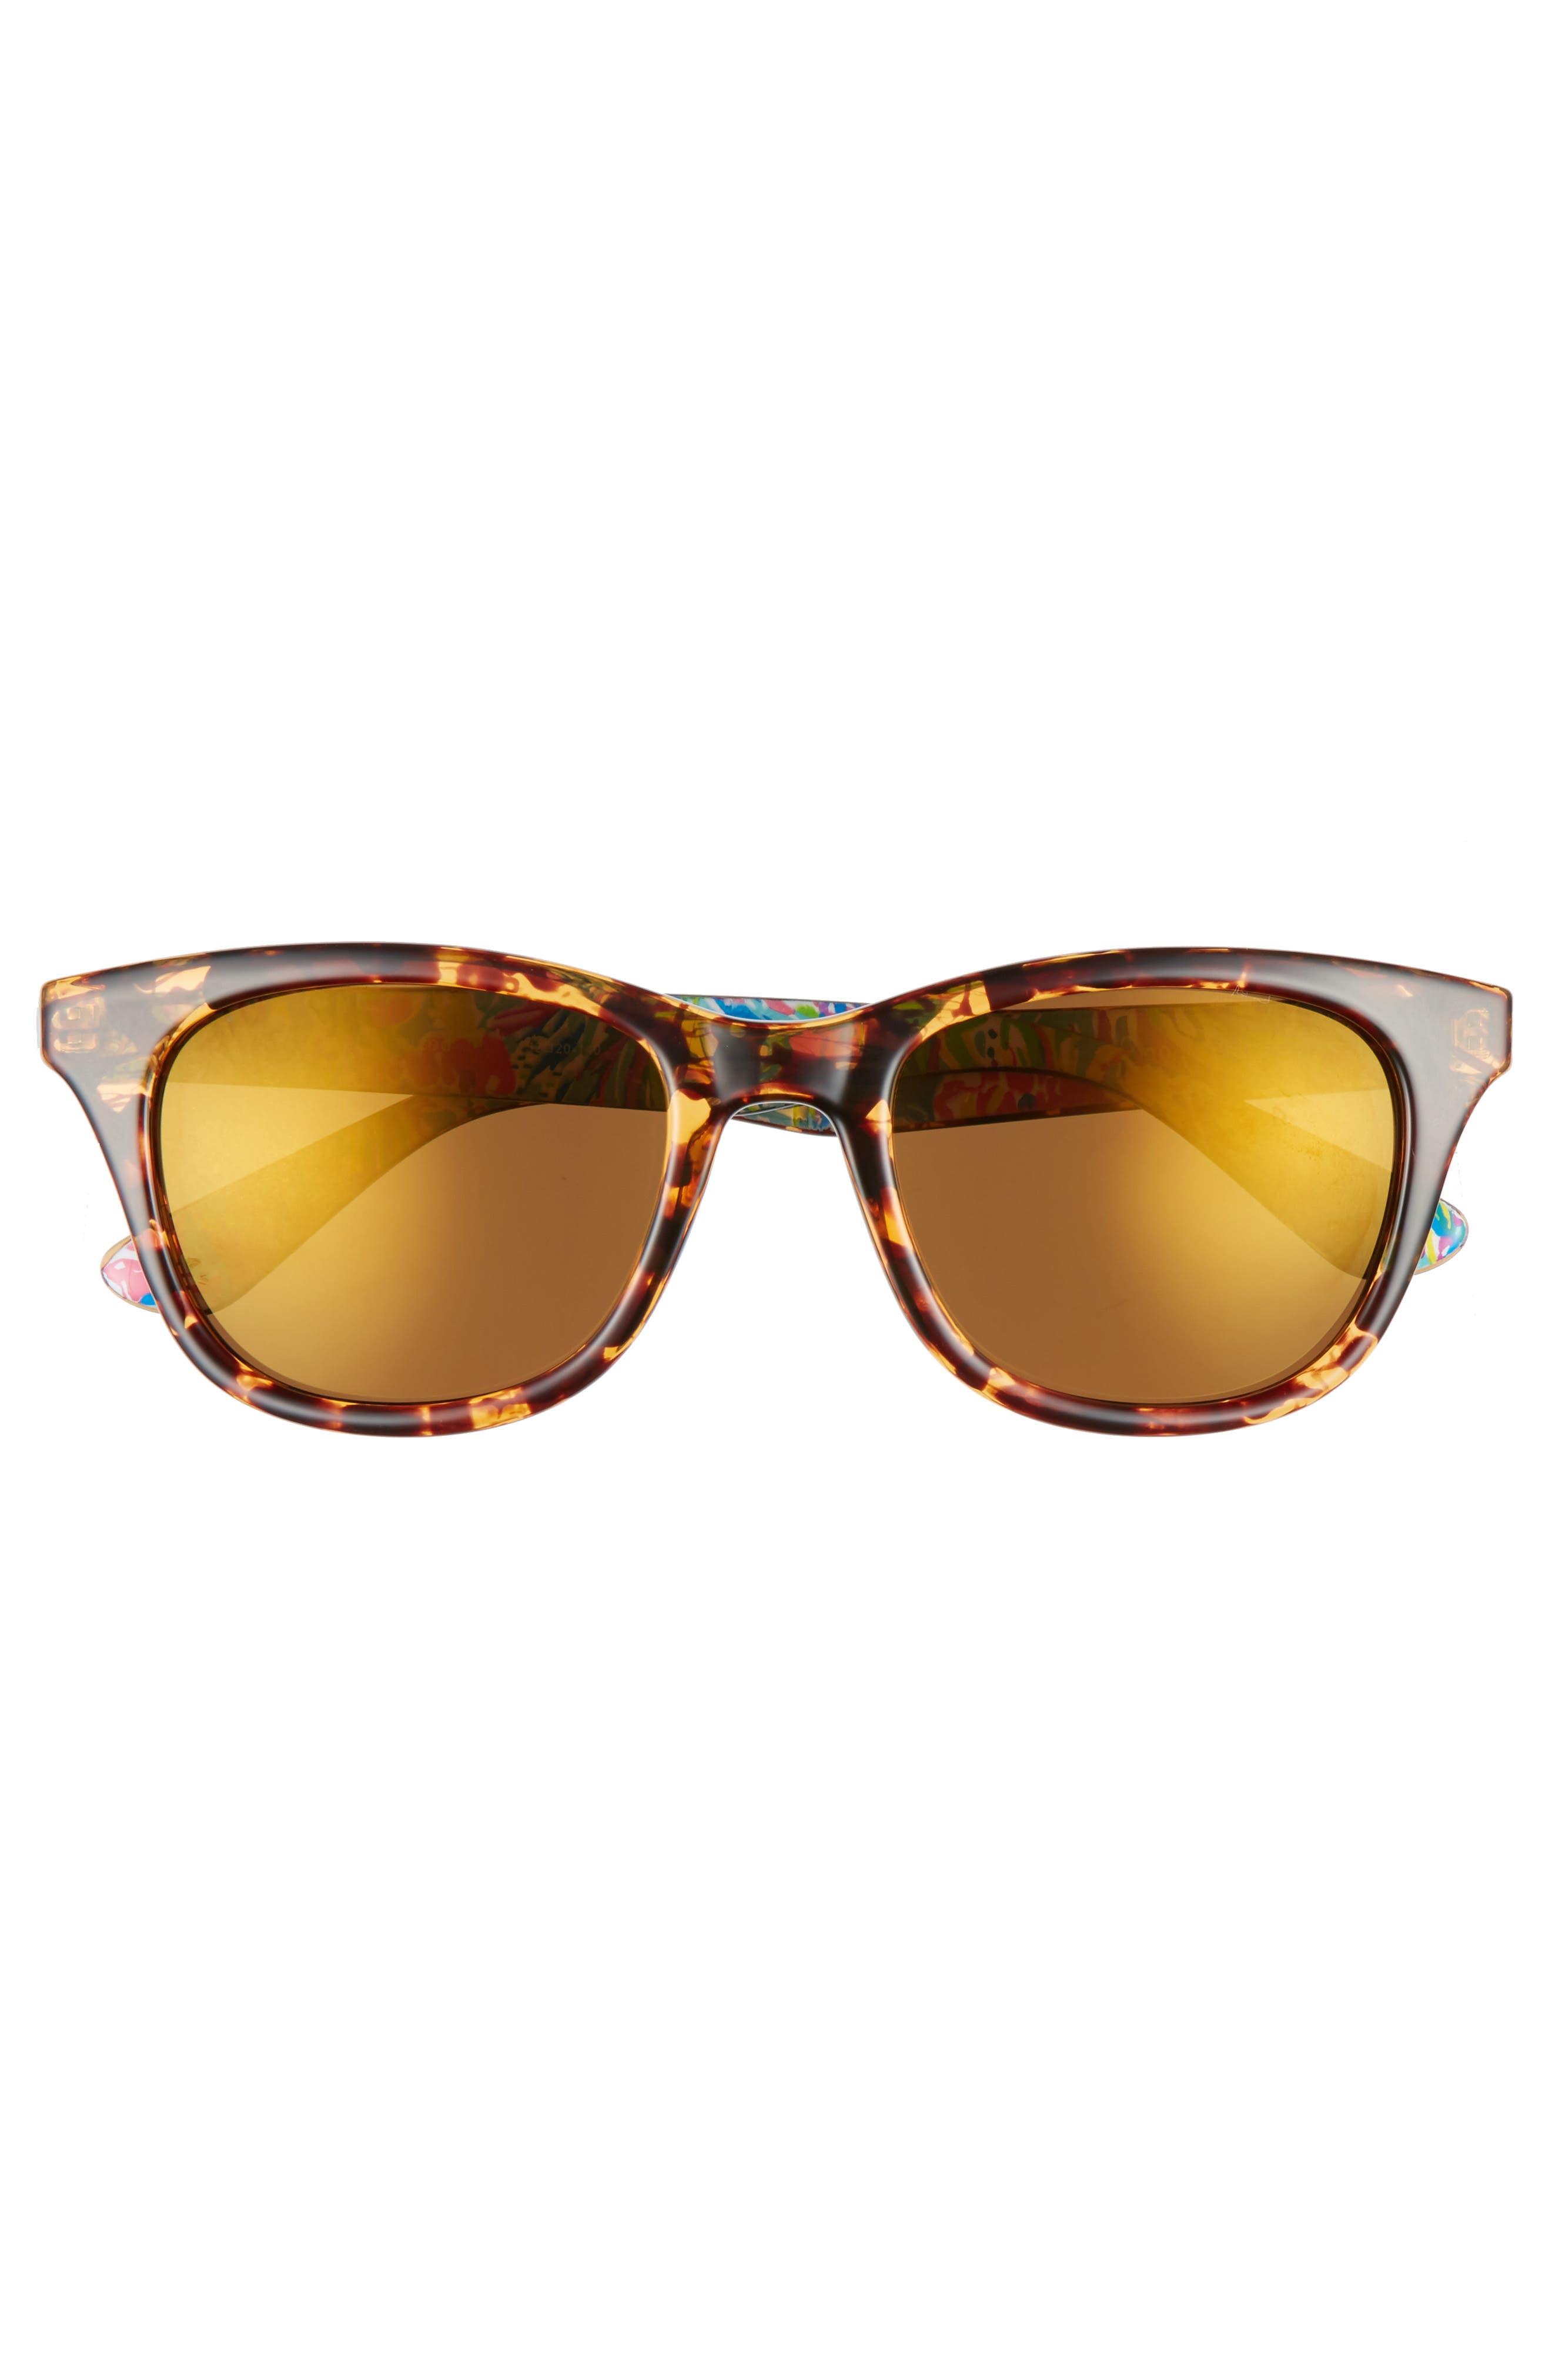 Alternate Image 3  - Lilly Pulitzer® Maddie 52mm Polarized Mirrored Sunglasses